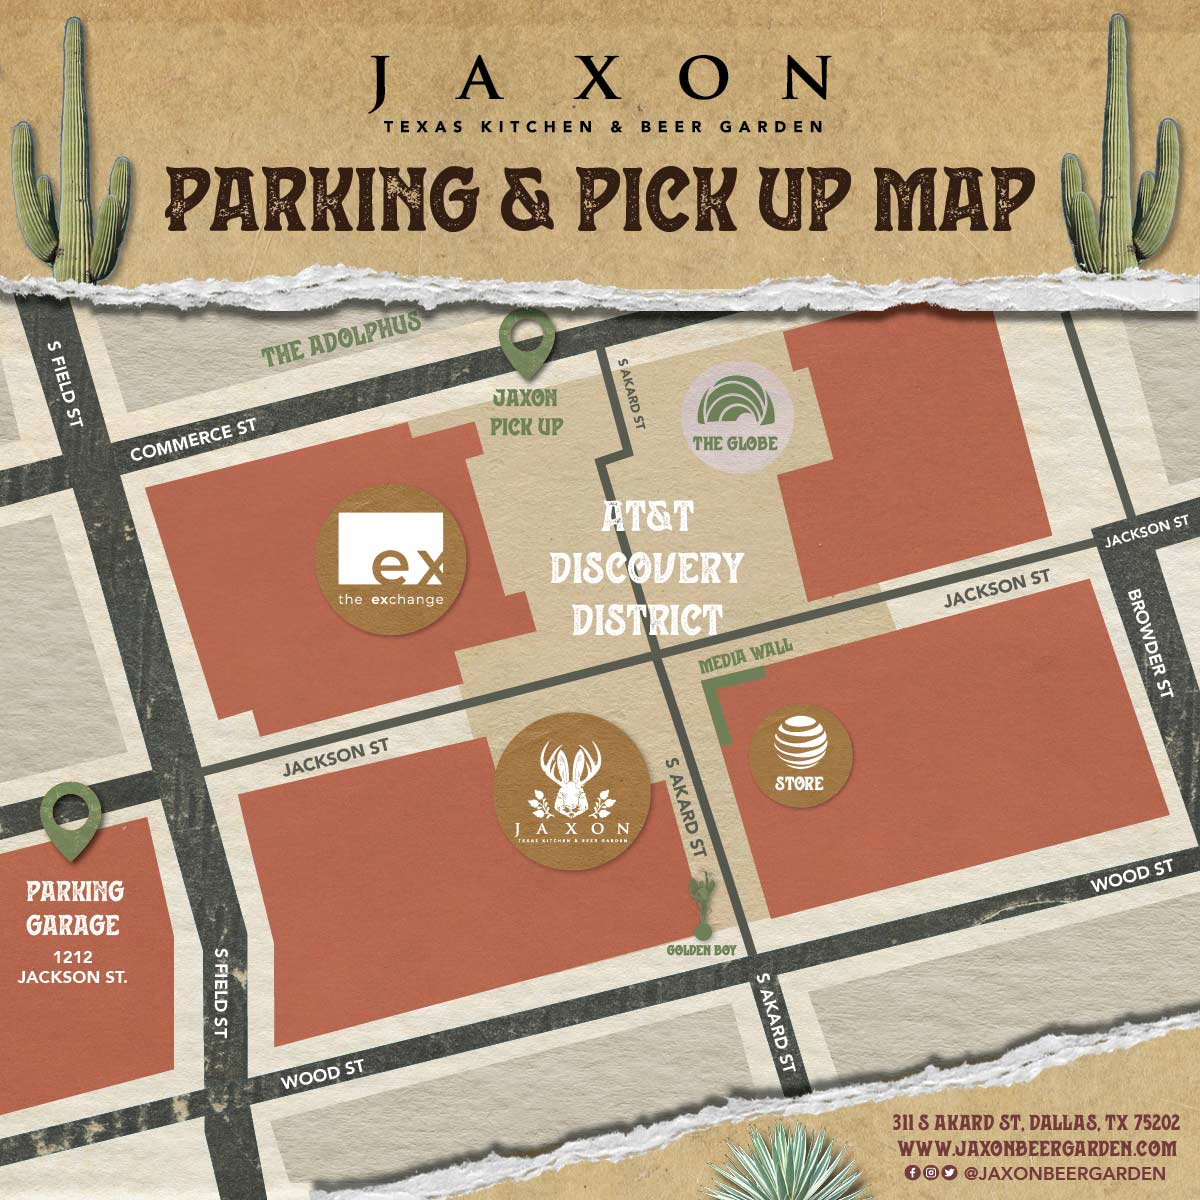 Faq Jaxon Texas Kitchen Beergarden